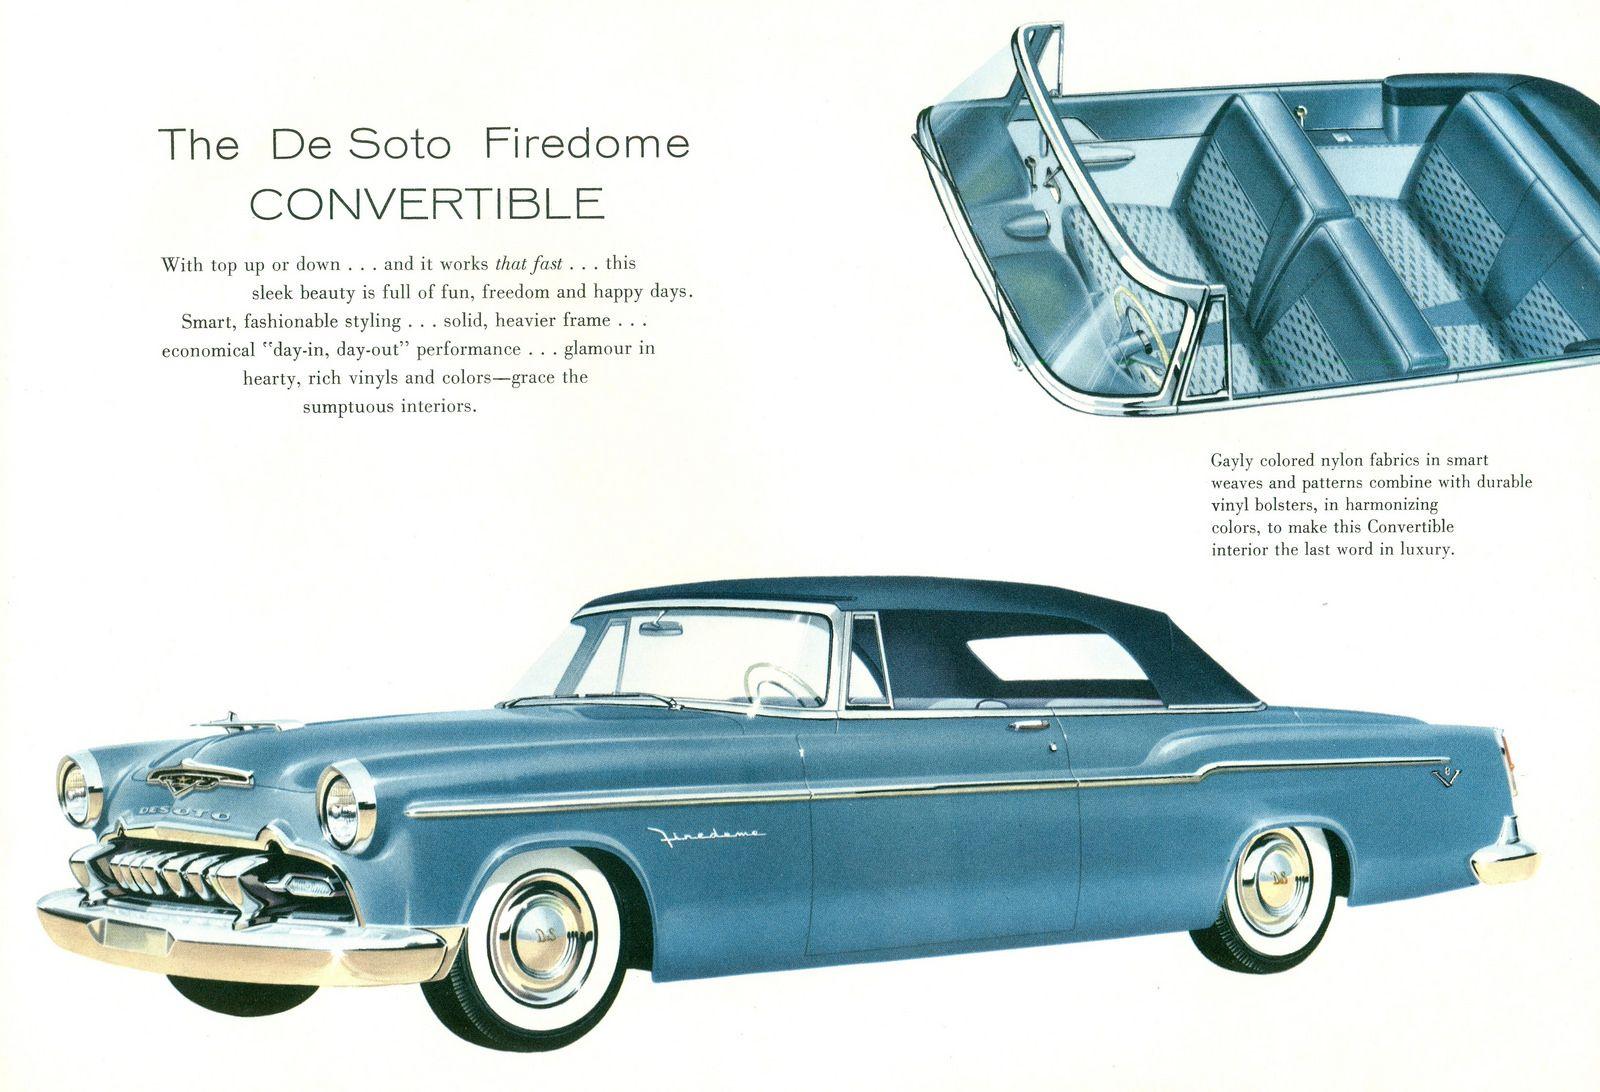 1955 De Soto Firedome Convertible Desoto Firedome Chevy Sports Cars Desoto Cars